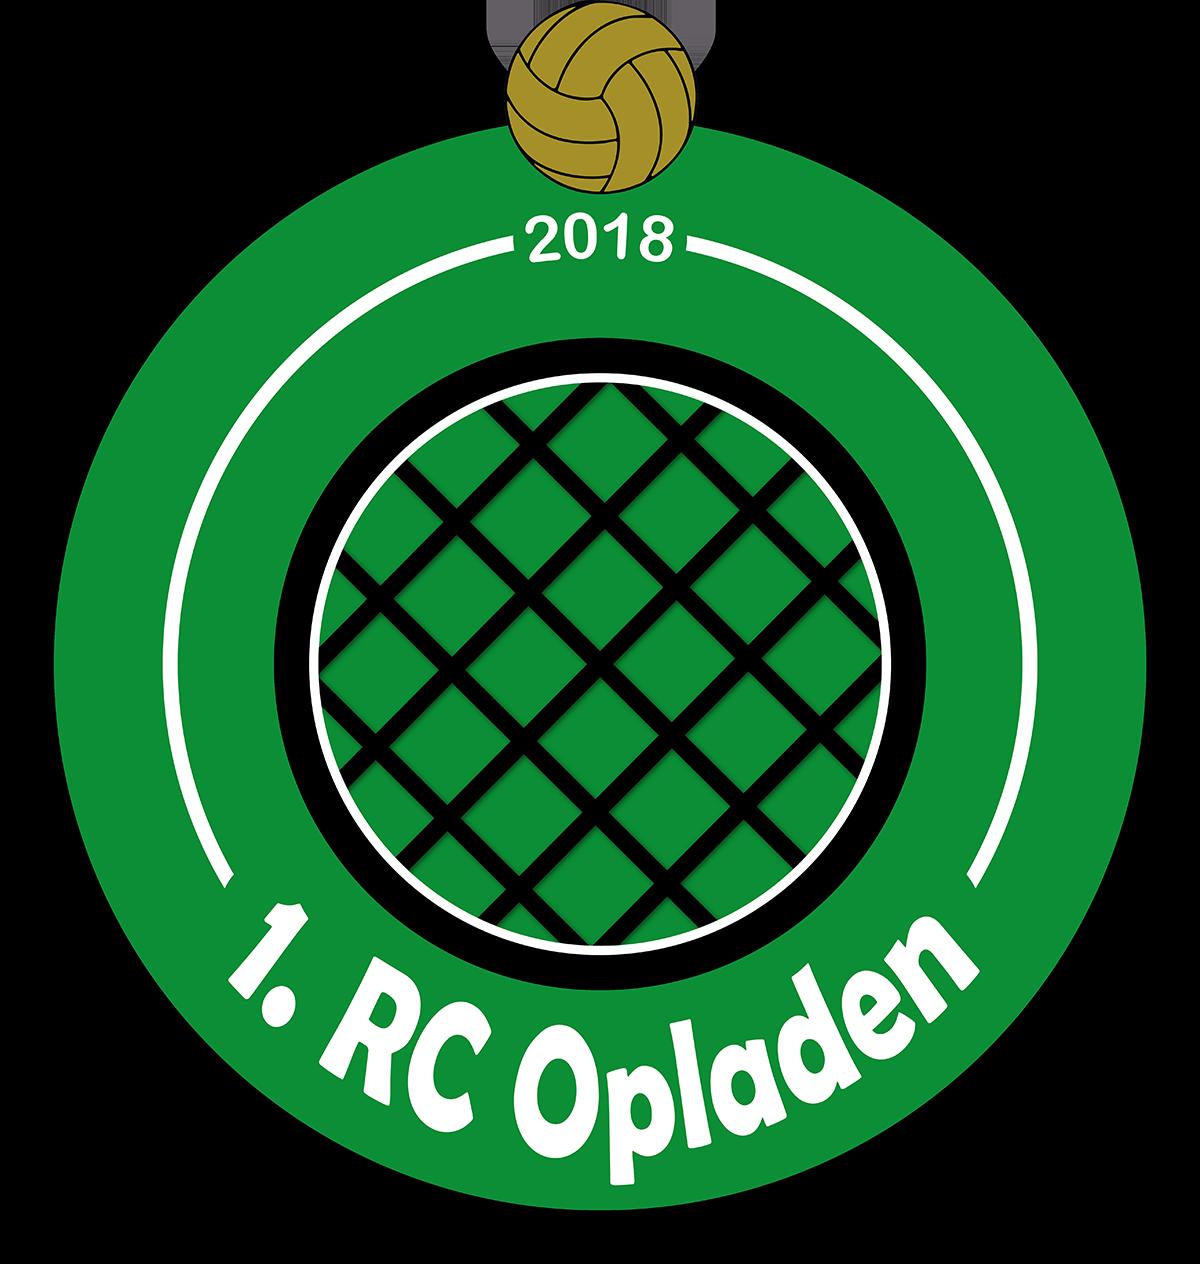 1. Roundnetclub Opladen e.V.